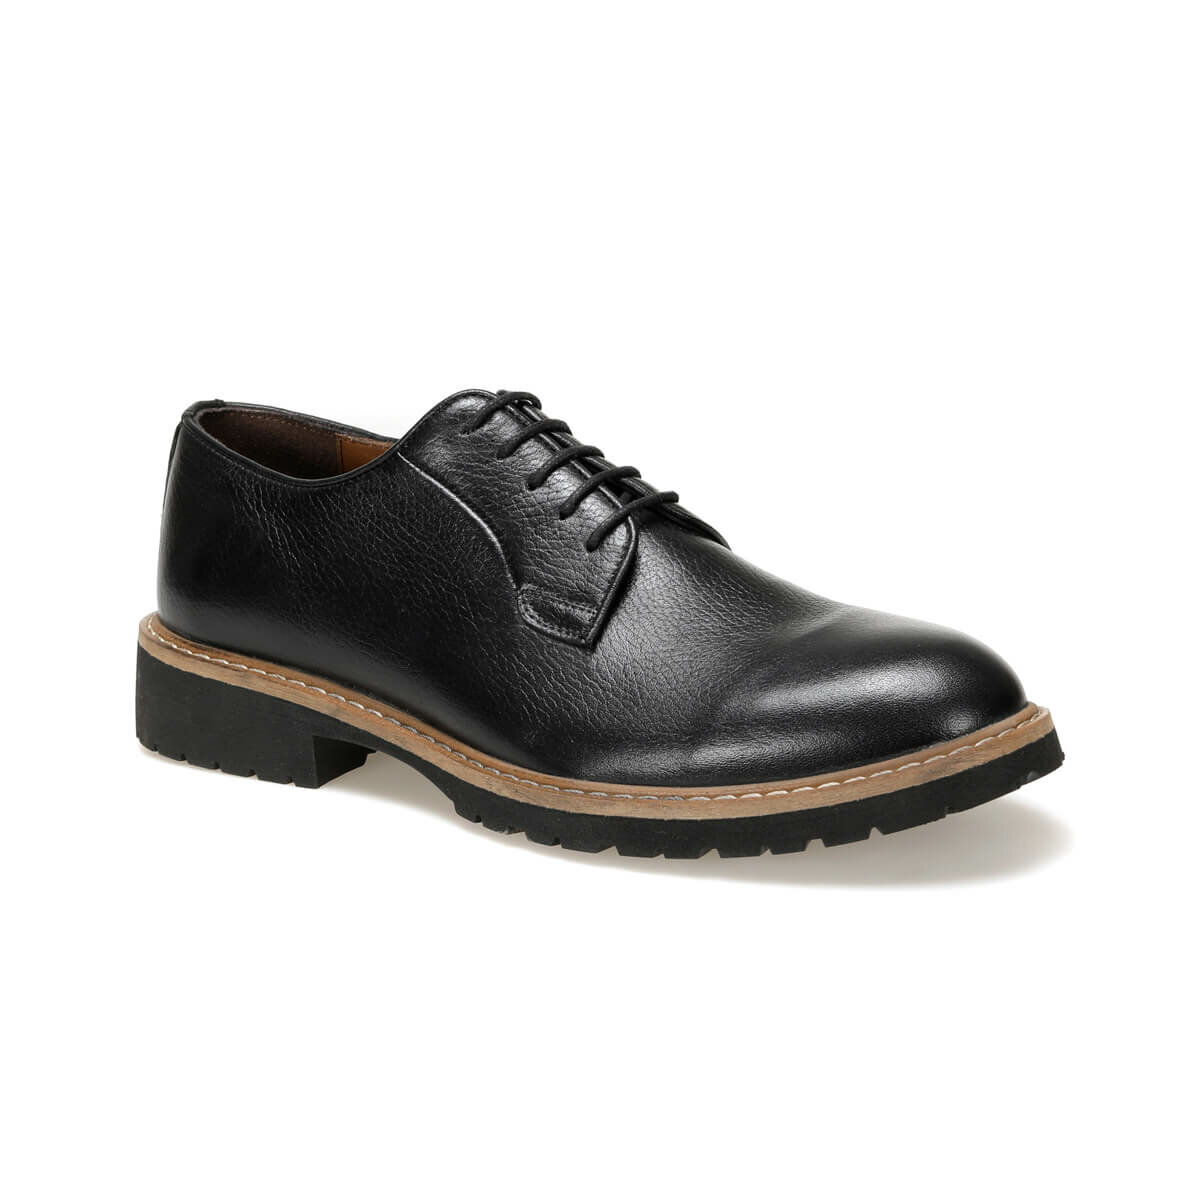 FLO 3693 Black Men 'S Classic Shoes Garamond